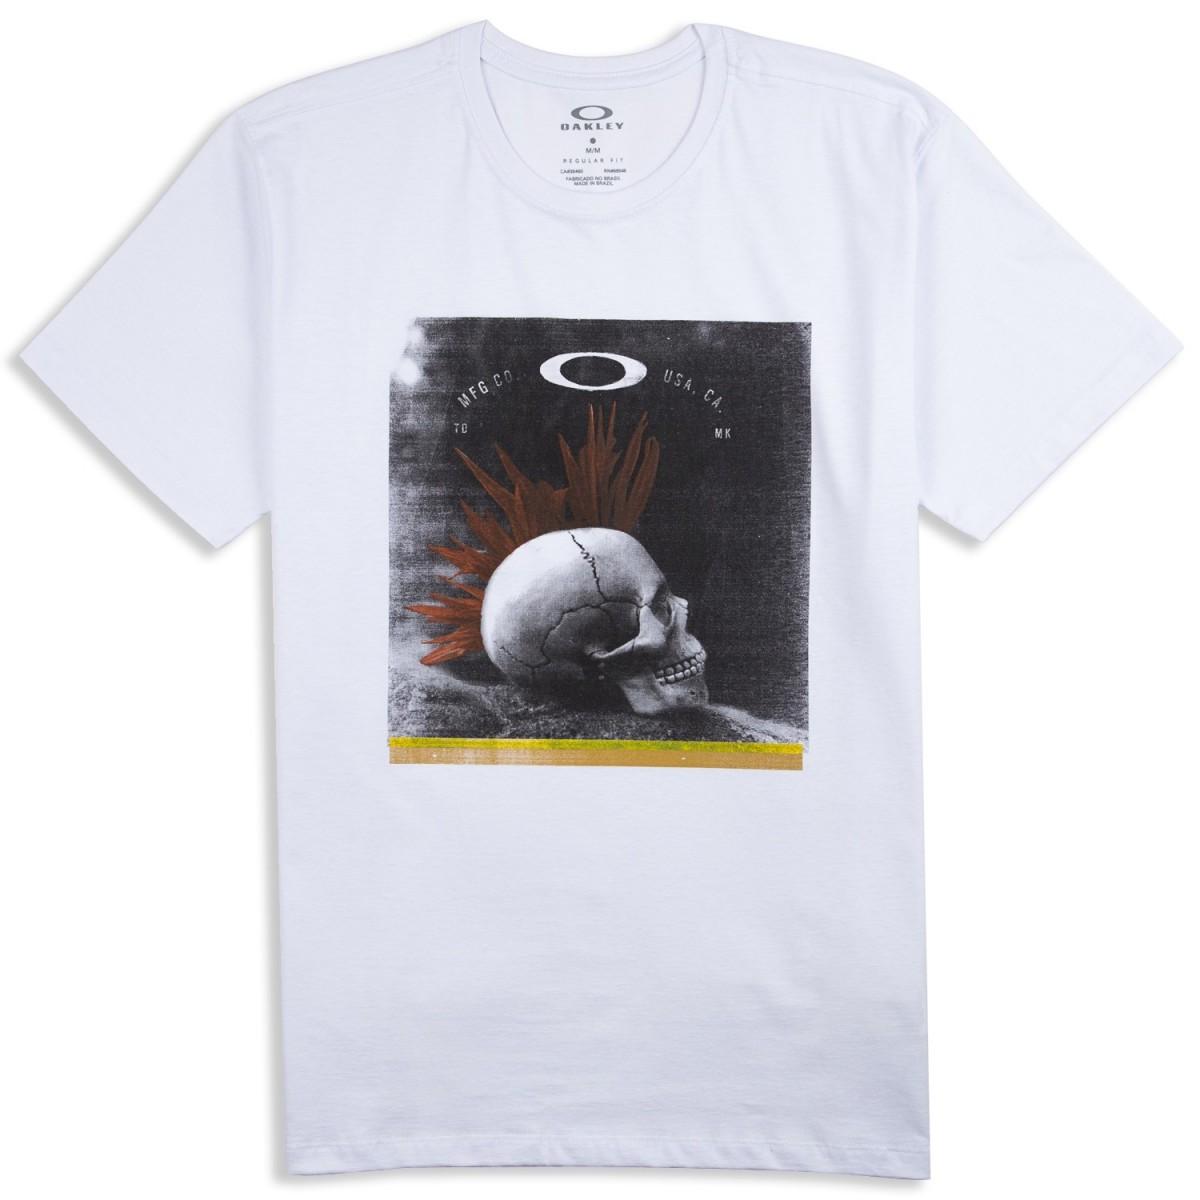 095e38d198b39 Camiseta Da Oakley Infantil – Southern California Weather Force